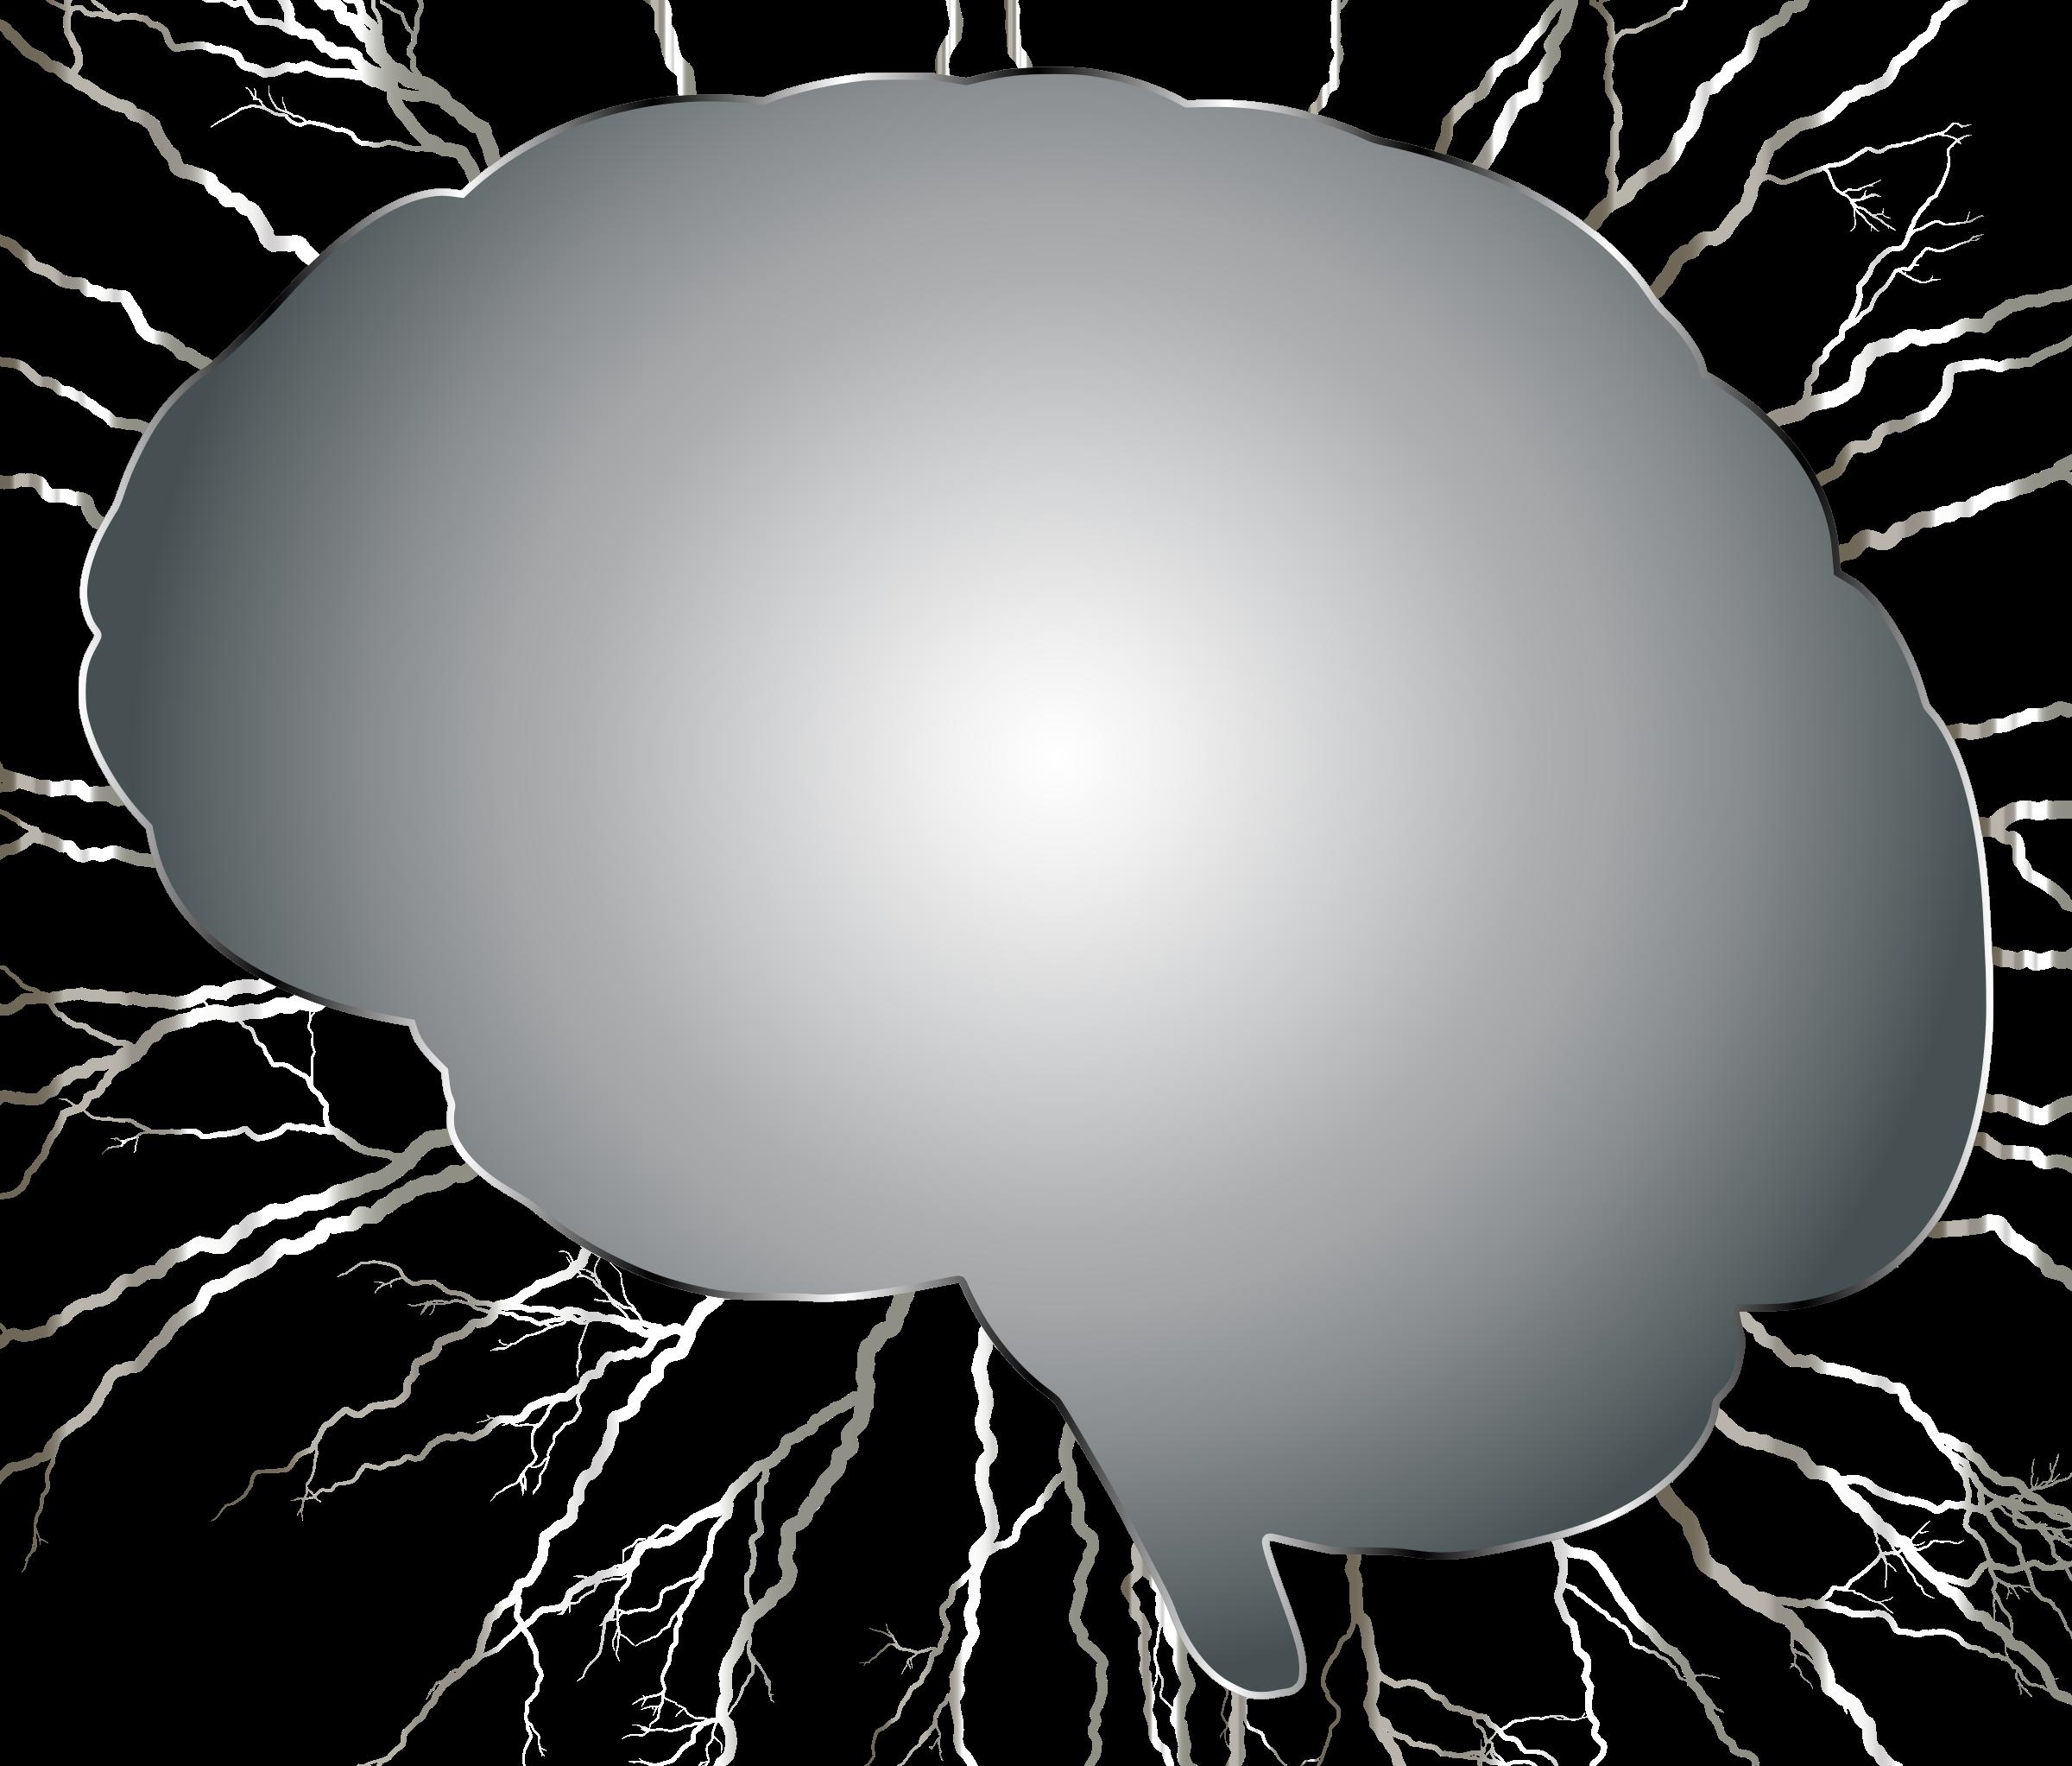 Psychology clipart brainstorming. Brain storm no background